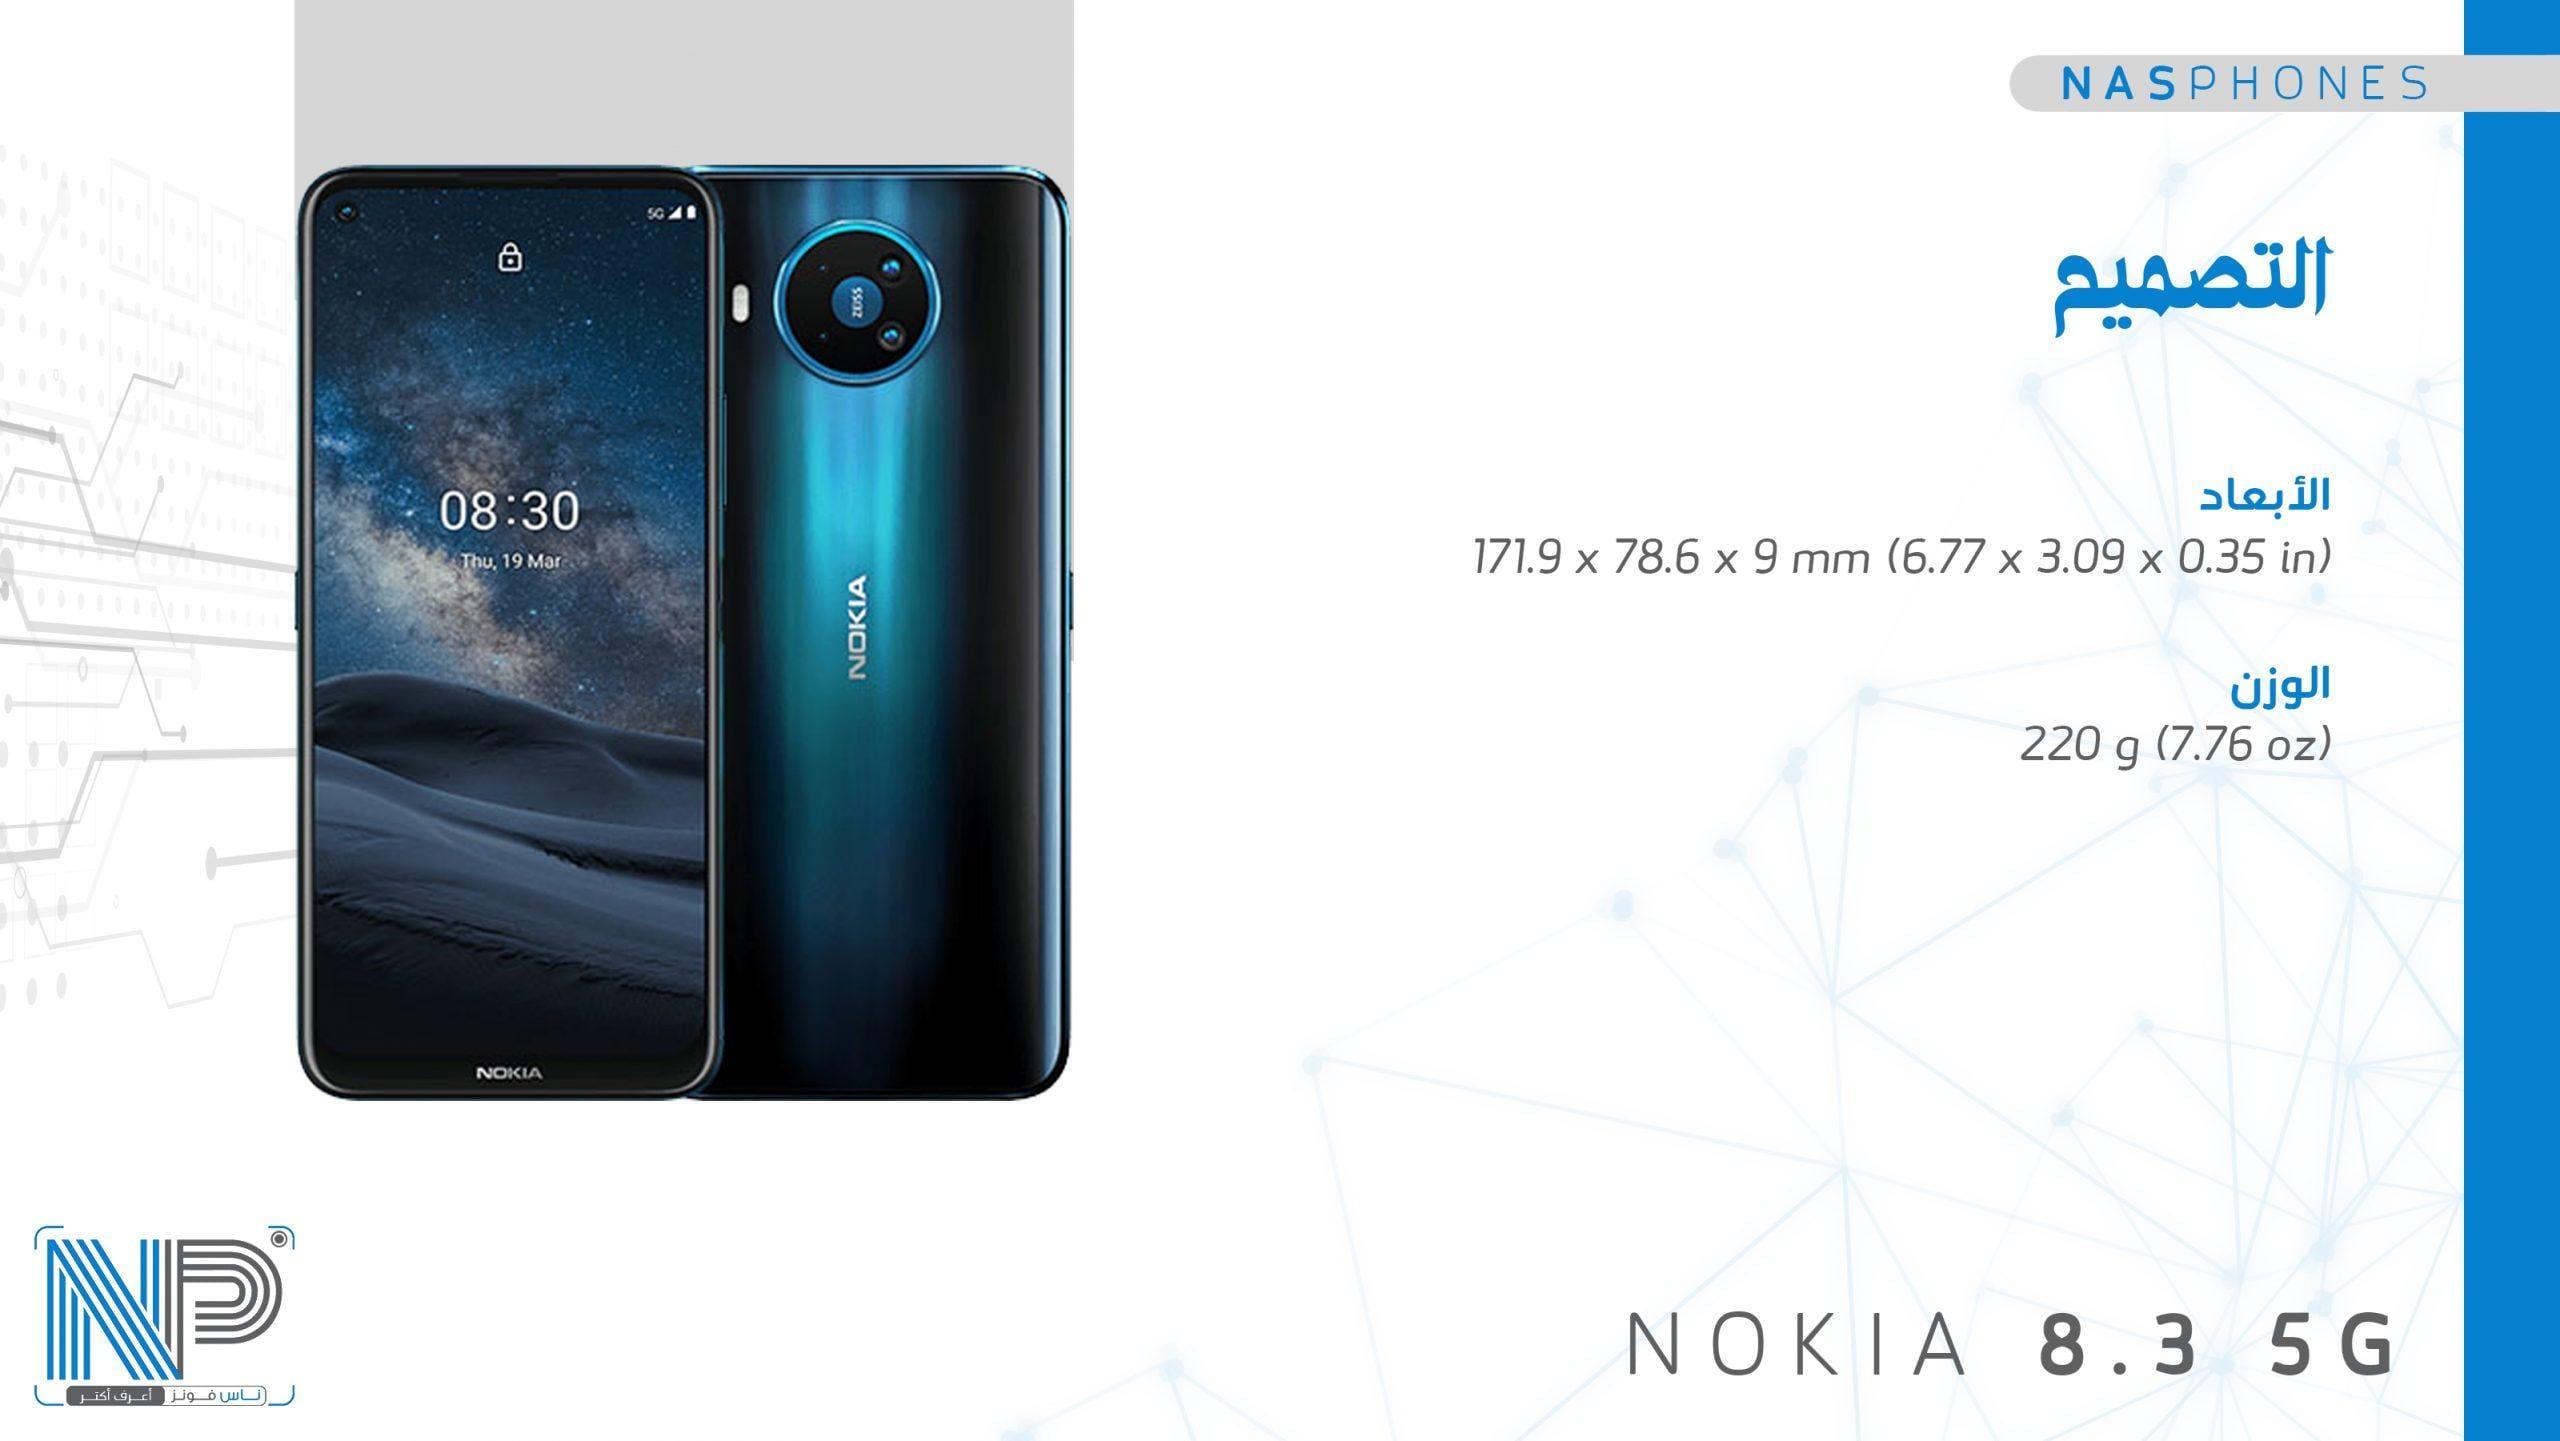 تصميم موبايل Nokia 8.3 5G